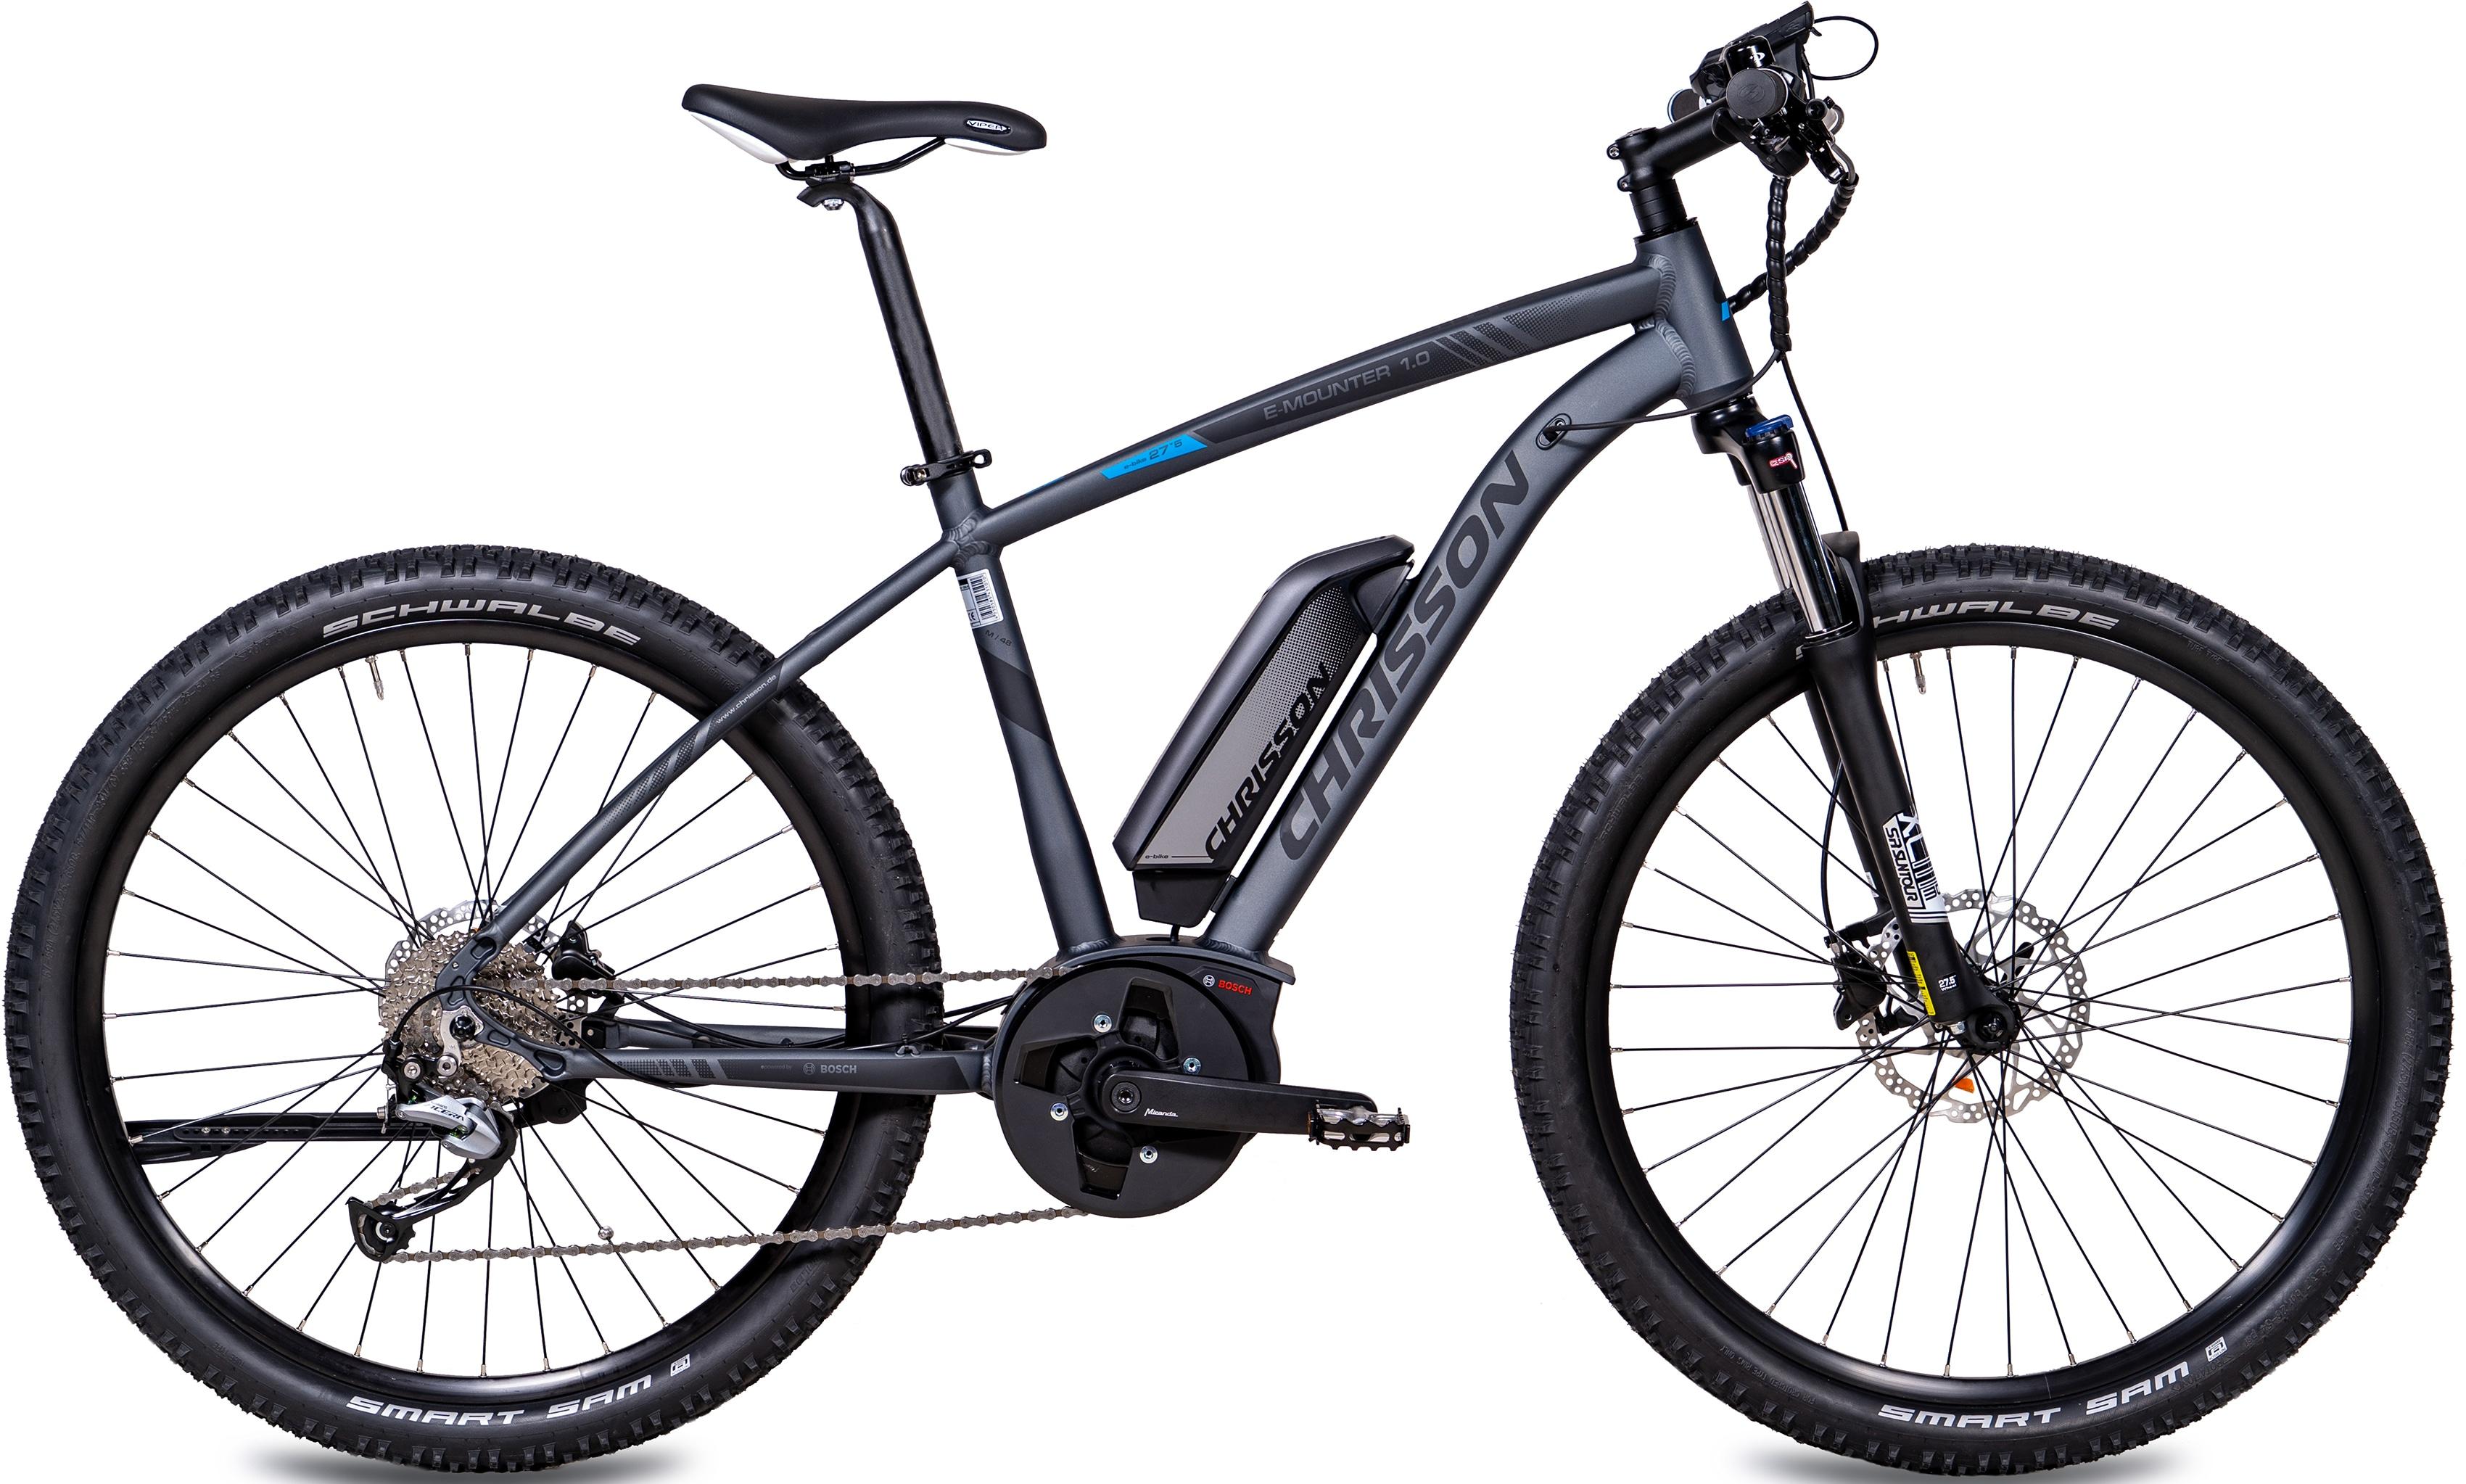 chrisson e bike e mounter 10 9 gang shimano acera rd m3000 sgs mittelmotor 250 w - Throttle me - Halte mich , Sieben Verlag